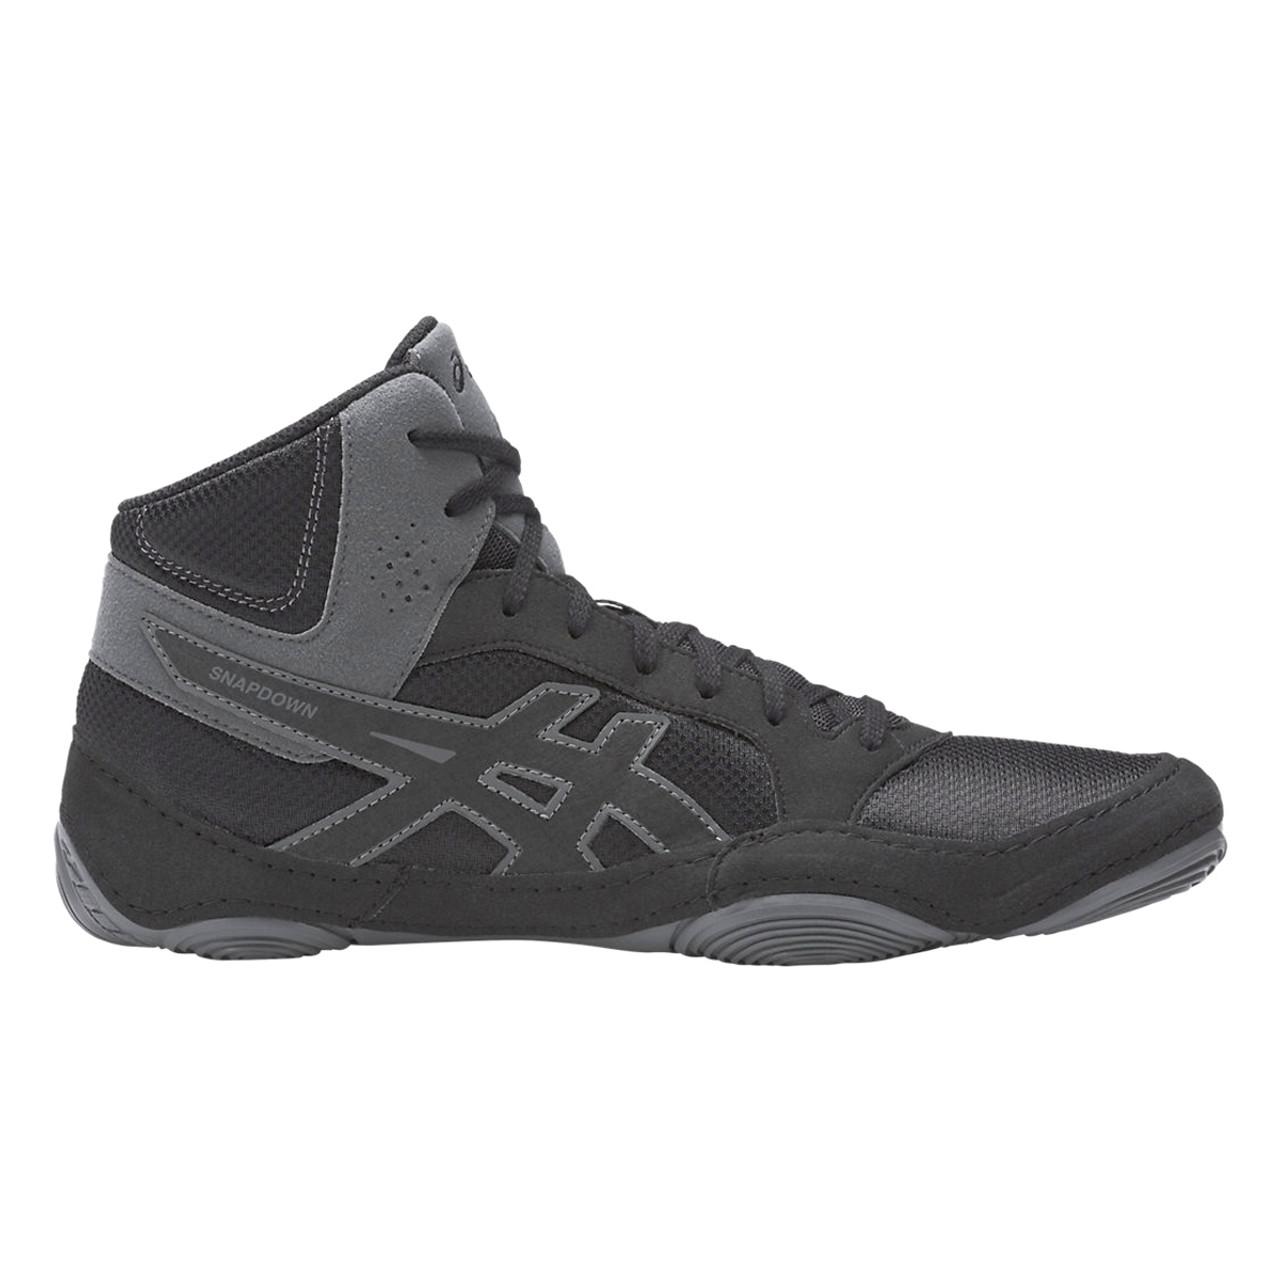 c21b0de85f7 Asics Snapdown 2 Men s Wrestling Shoes - Black